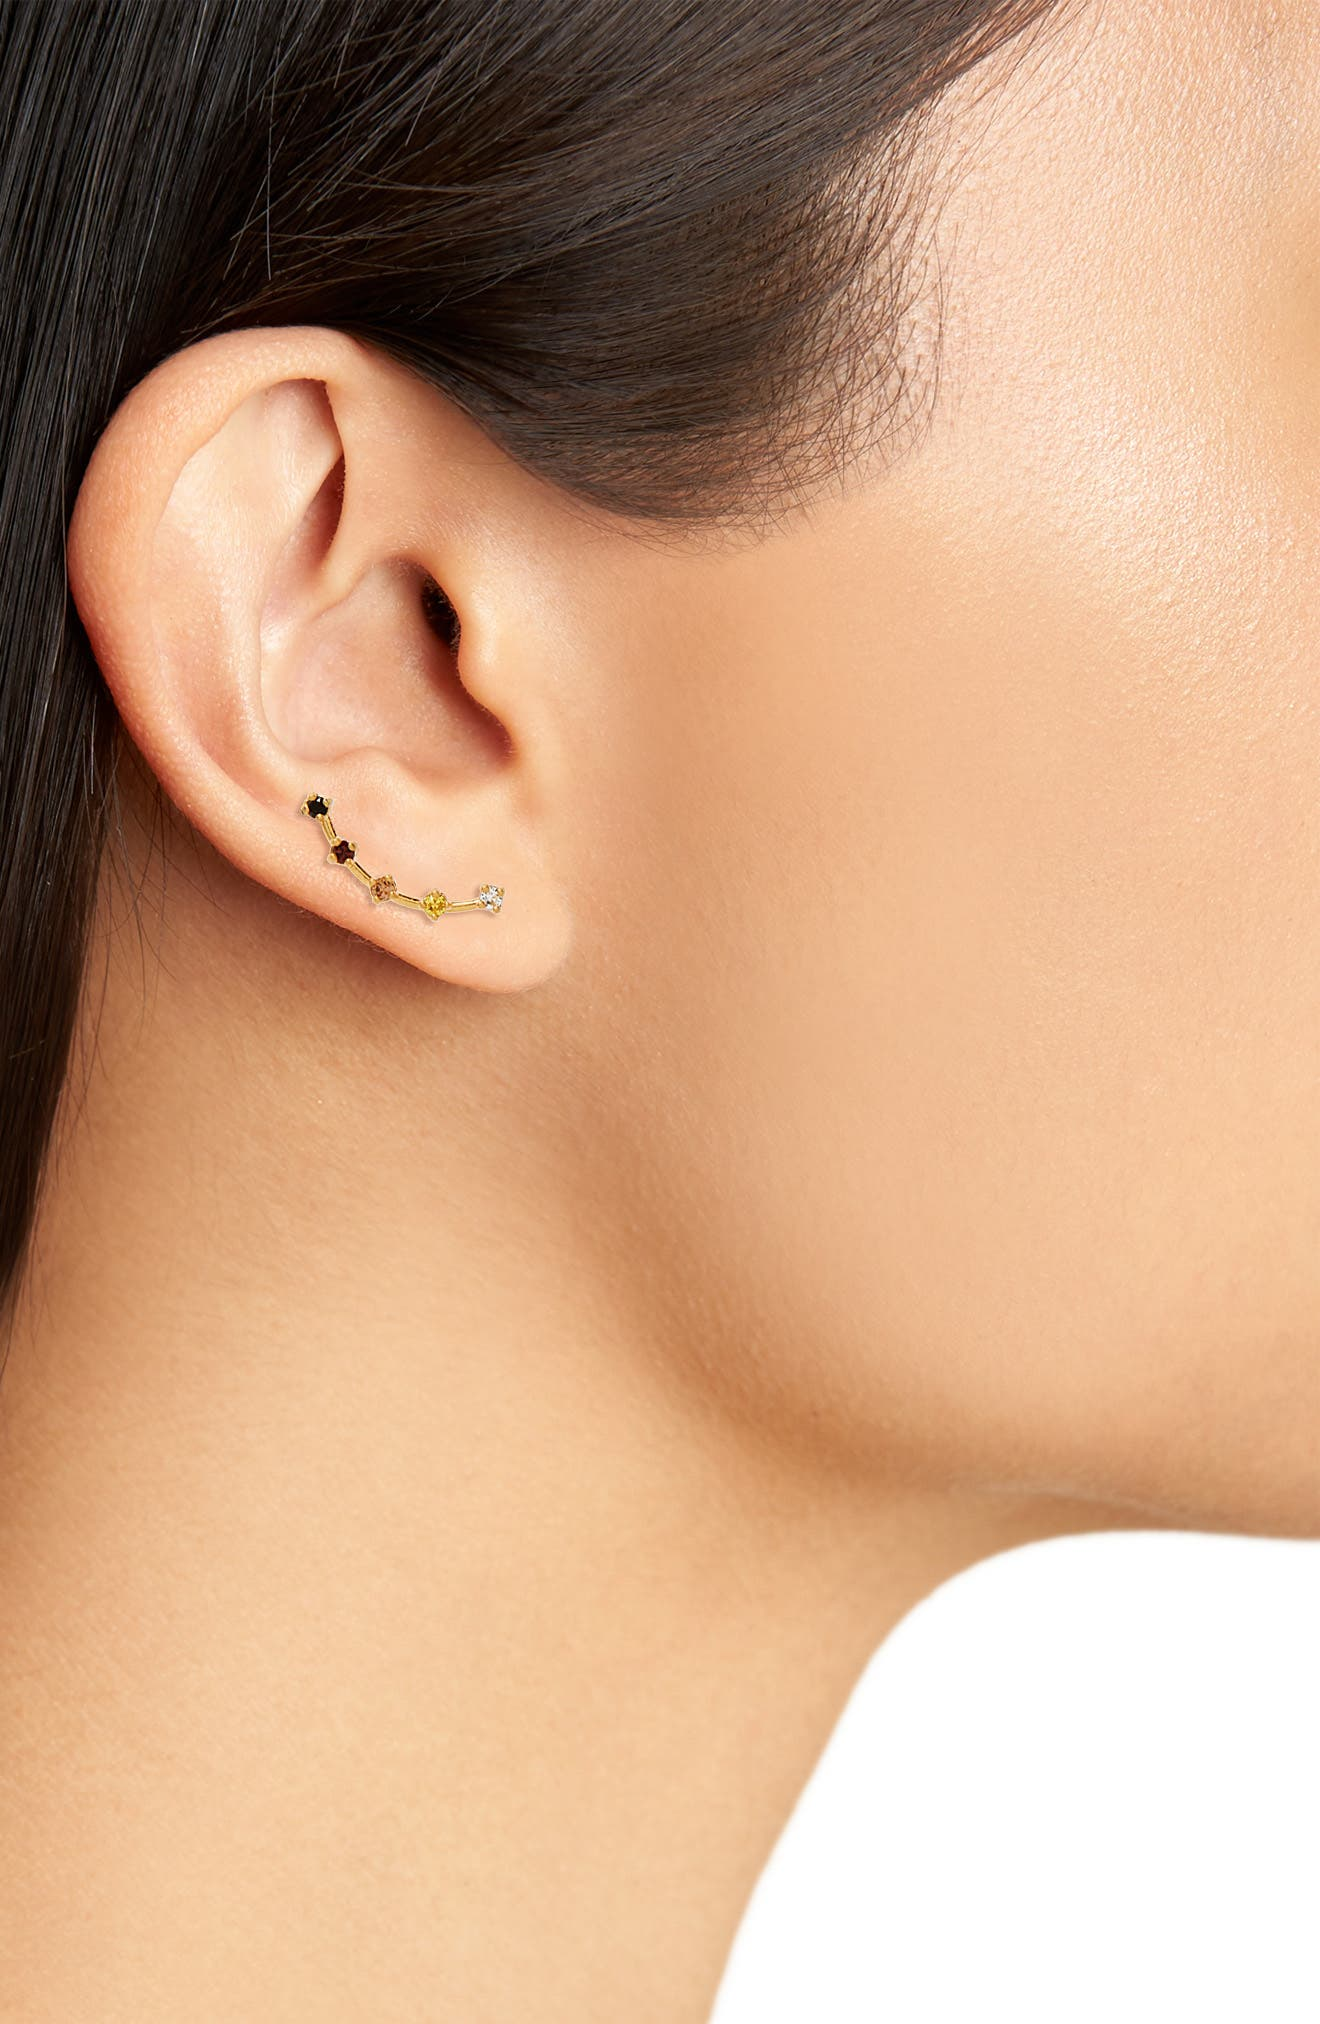 Gem Line Ear Crawlers,                             Alternate thumbnail 2, color,                             710